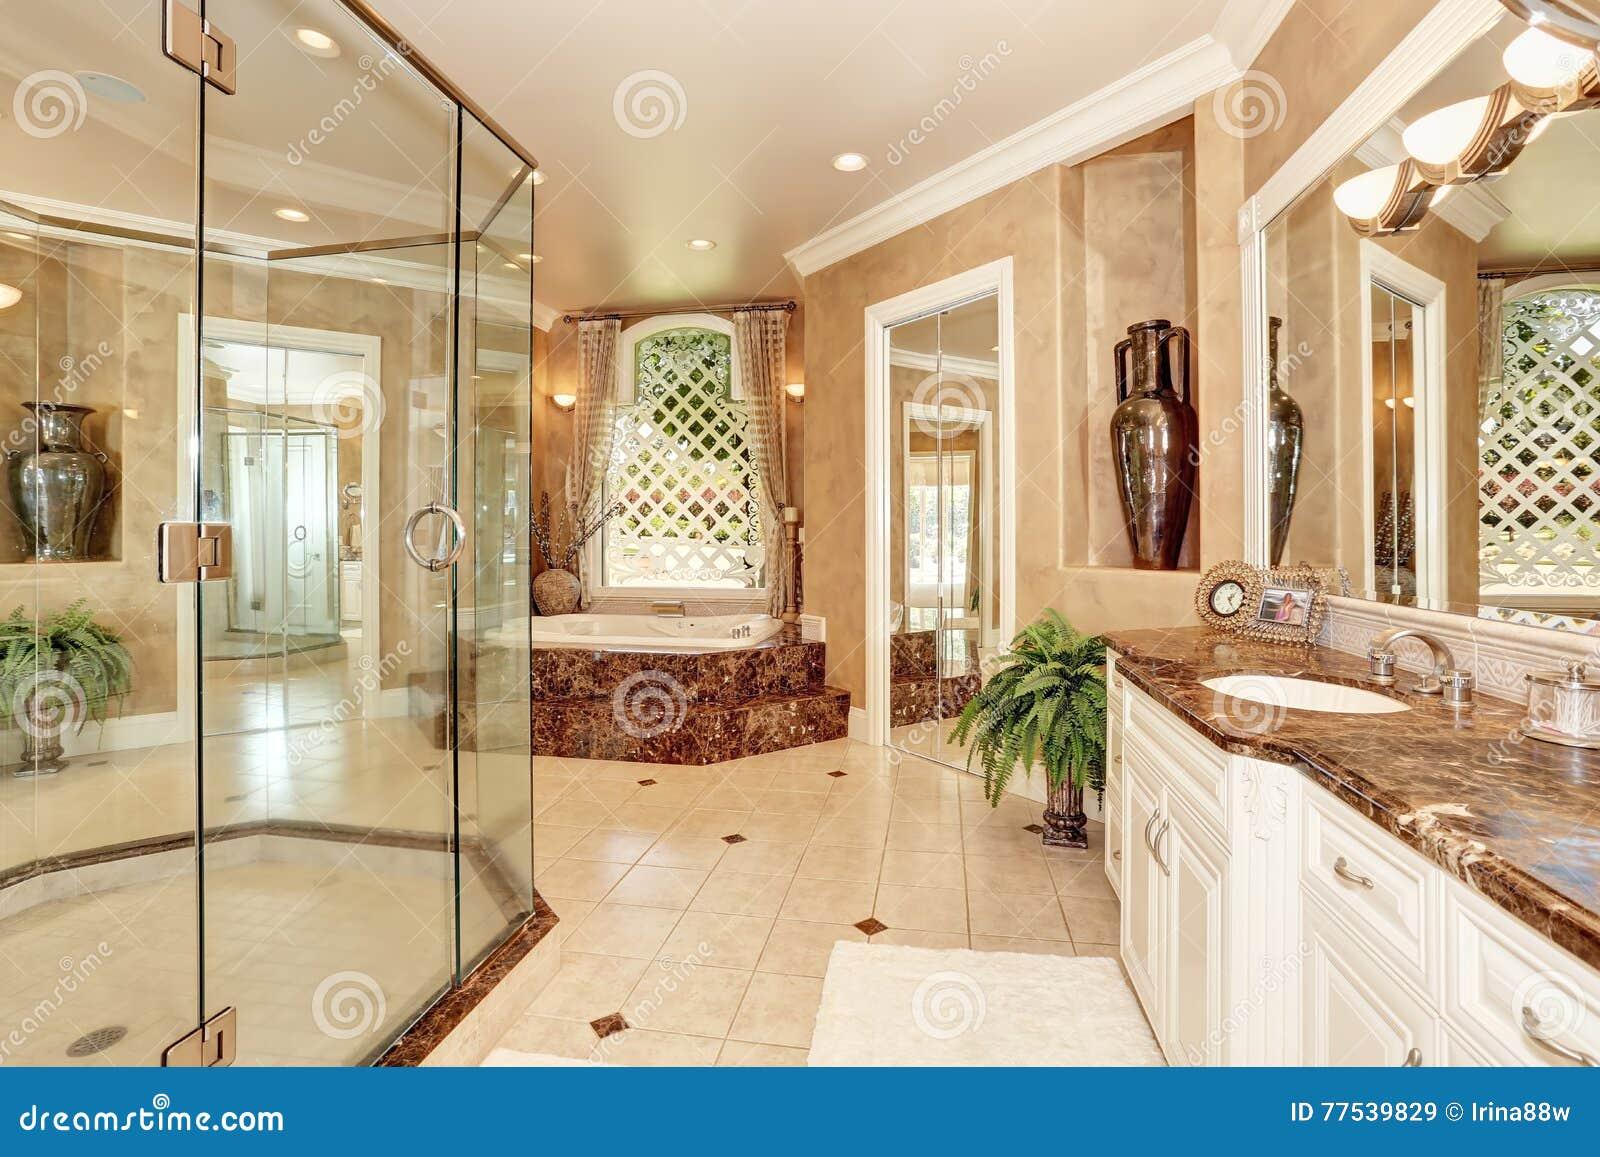 Pi kny luksusu marmuru azienki wn trze w be owym kolorze for Salle de bain d hotel luxe